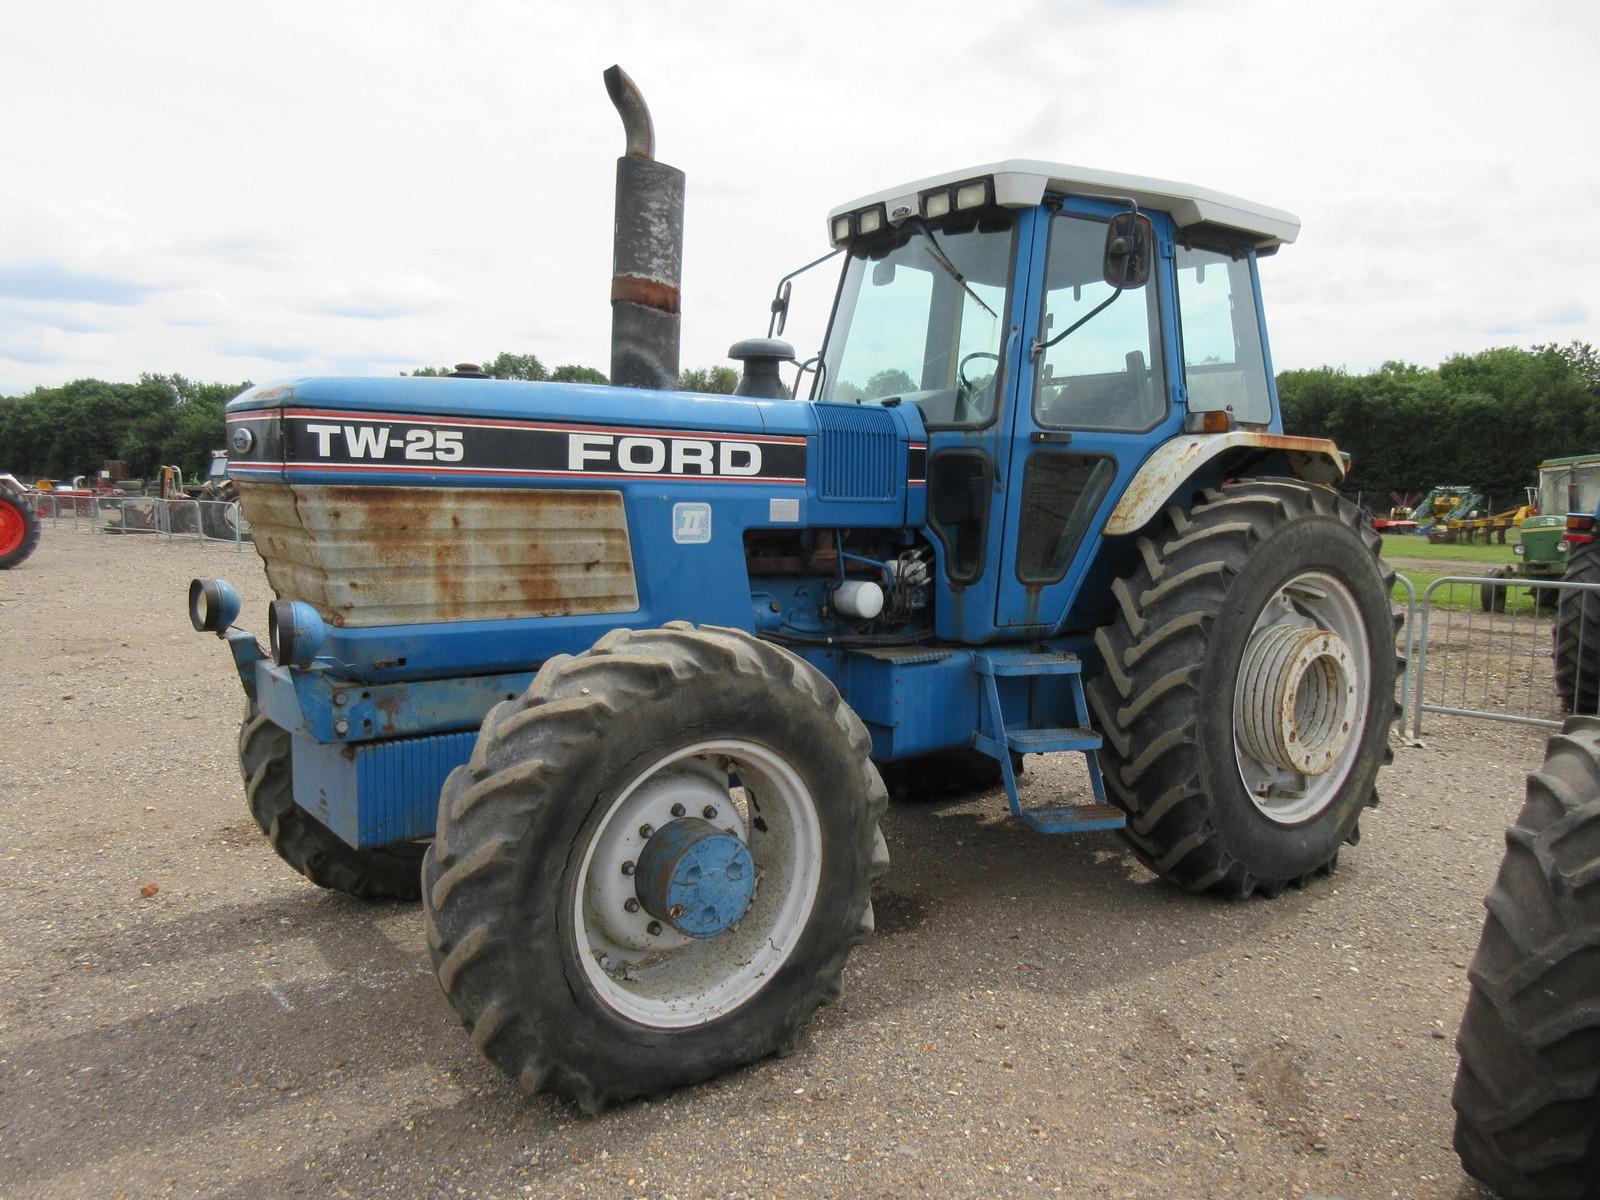 1990 ford tw 25 gen ii 6cylinder diesel tractor fitted. Black Bedroom Furniture Sets. Home Design Ideas